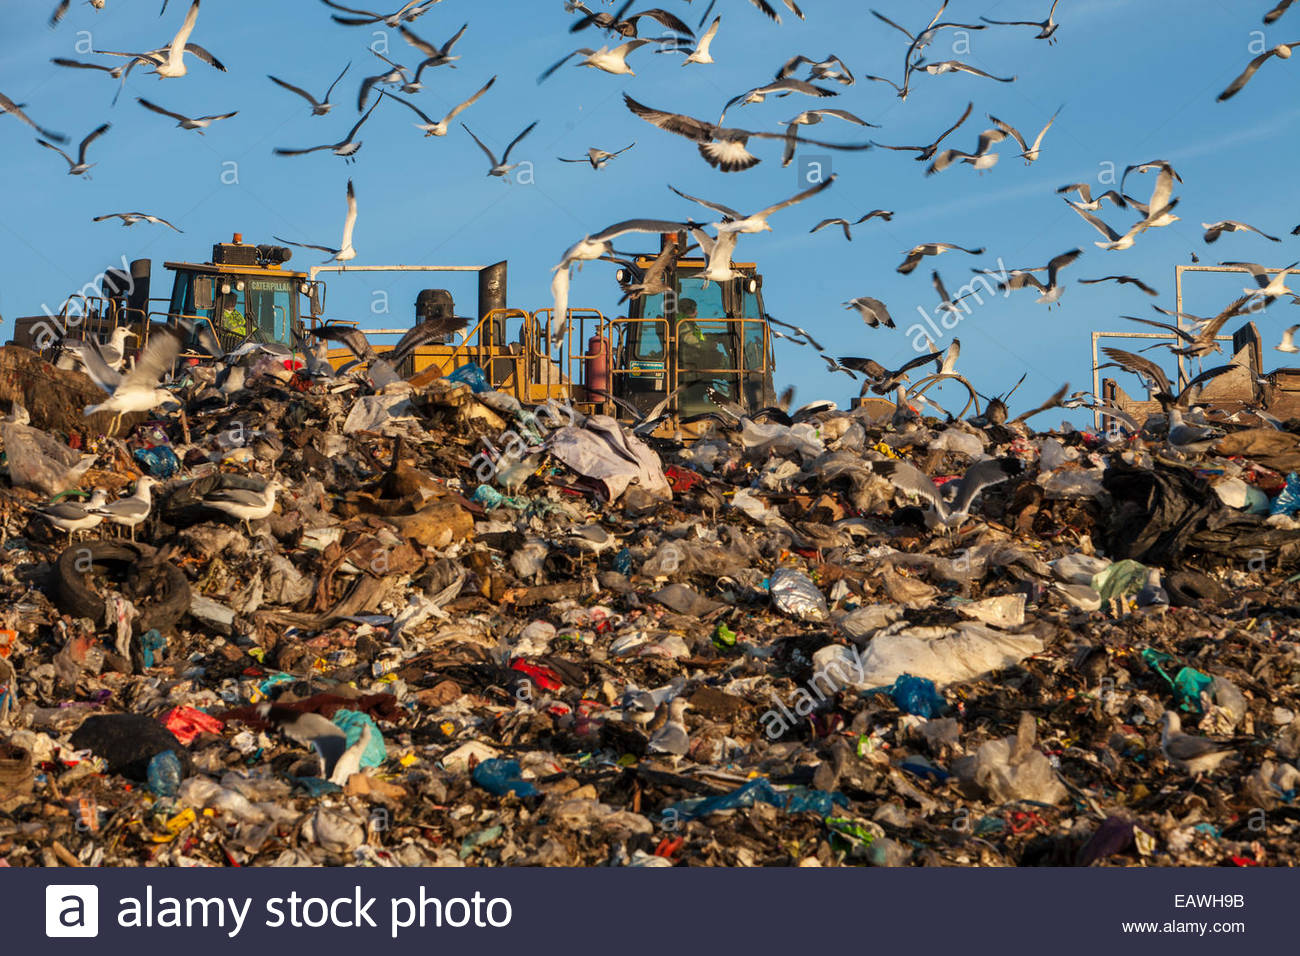 A landfill generates liquified natural gas. - Stock Image